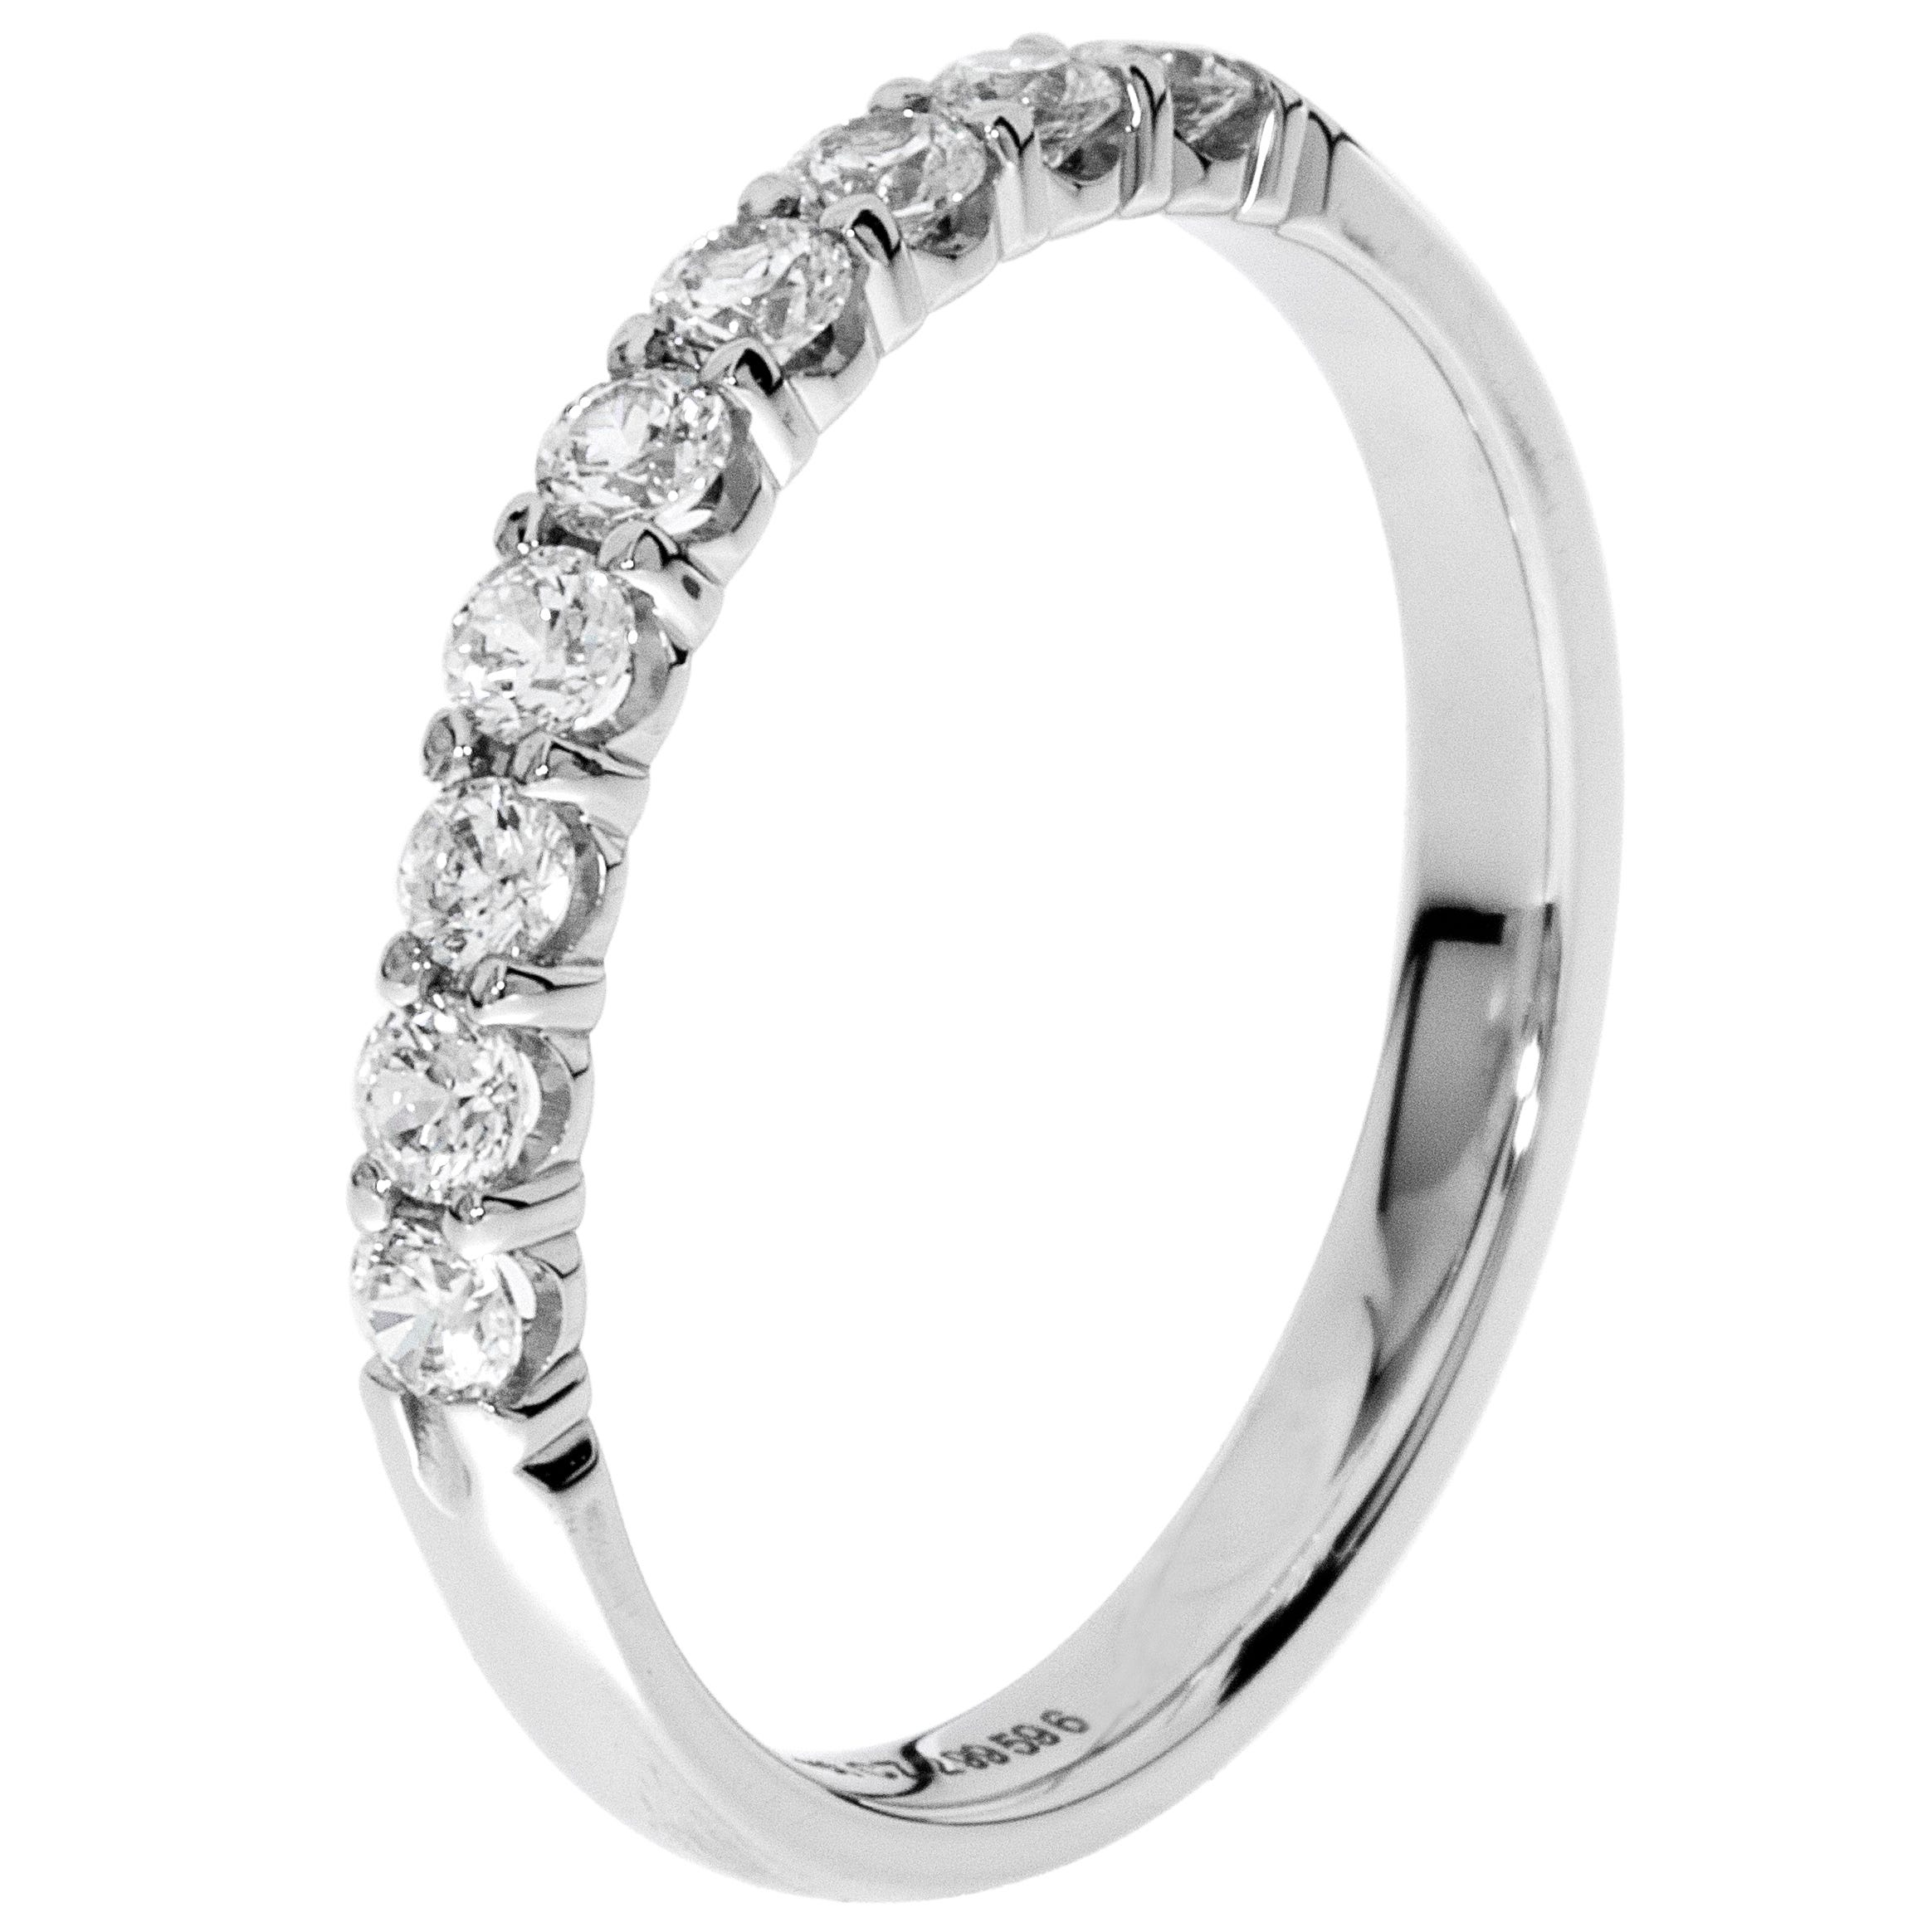 Platinum Diamond Wedding Band 1/3 ctw. (H-I, I1-2)